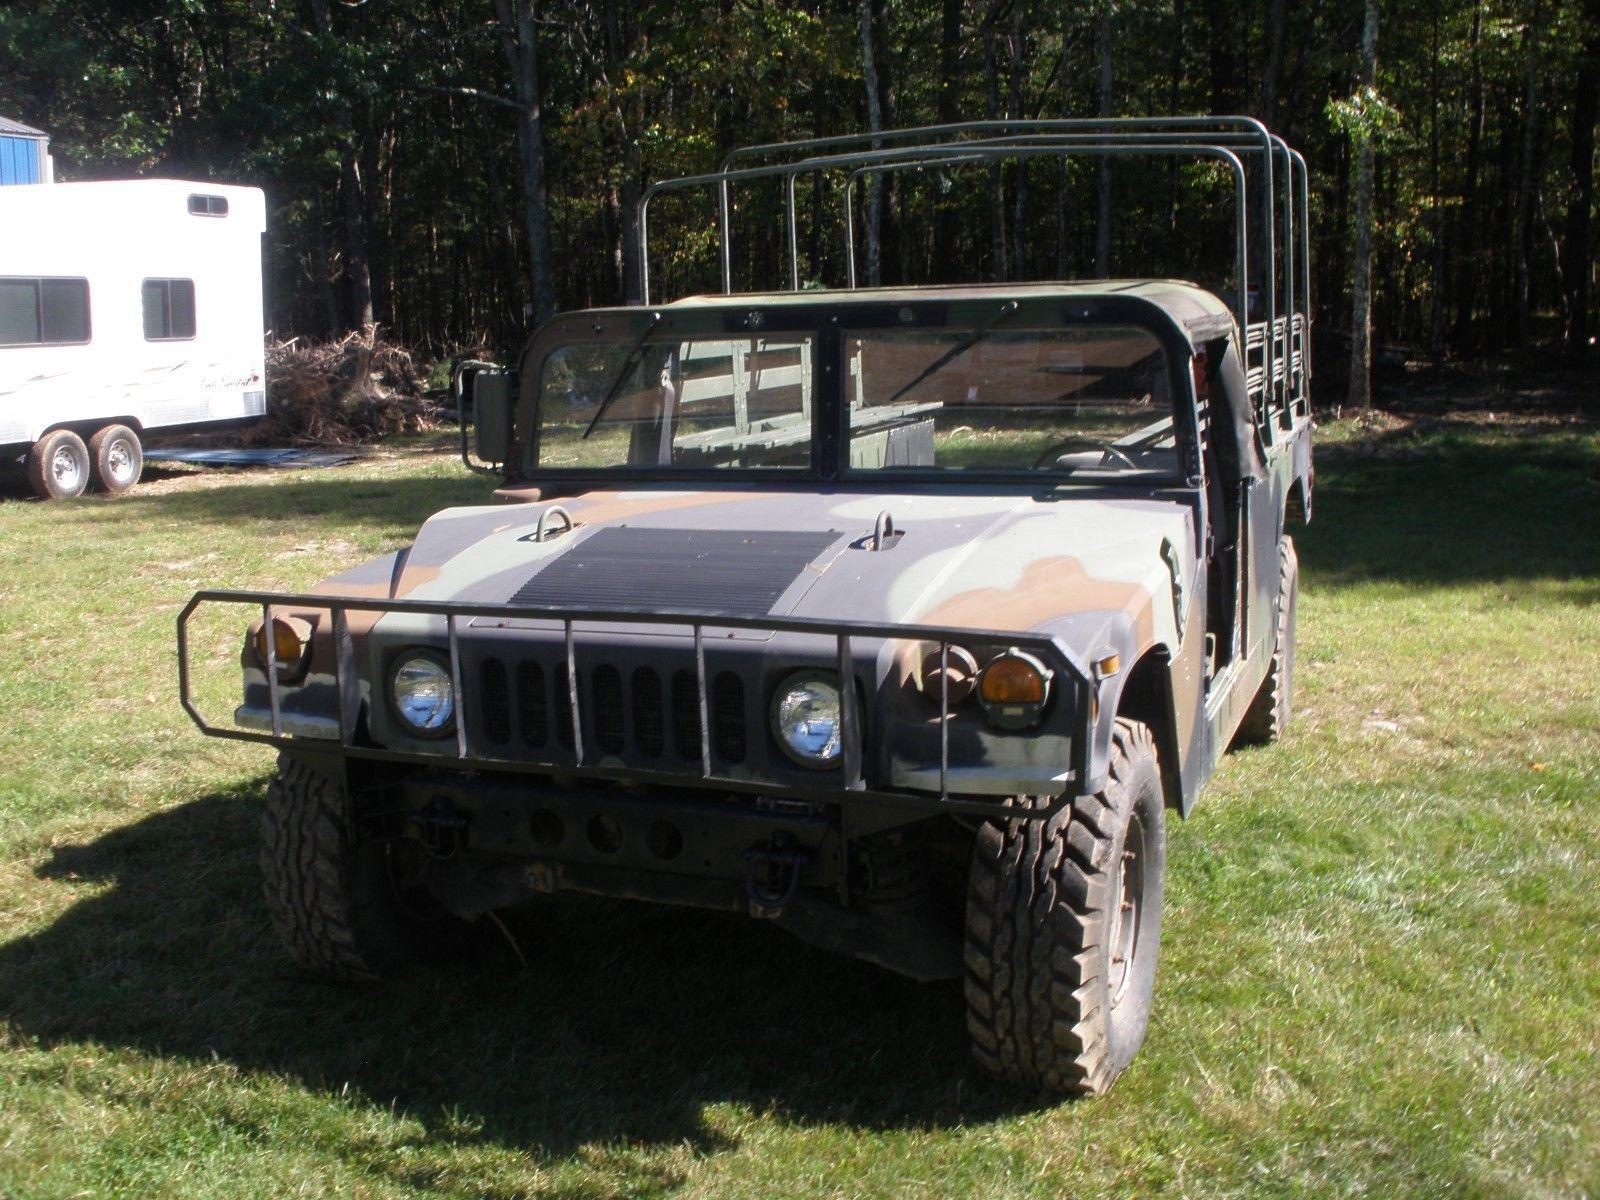 doors missing 1991 Am General Hummer military